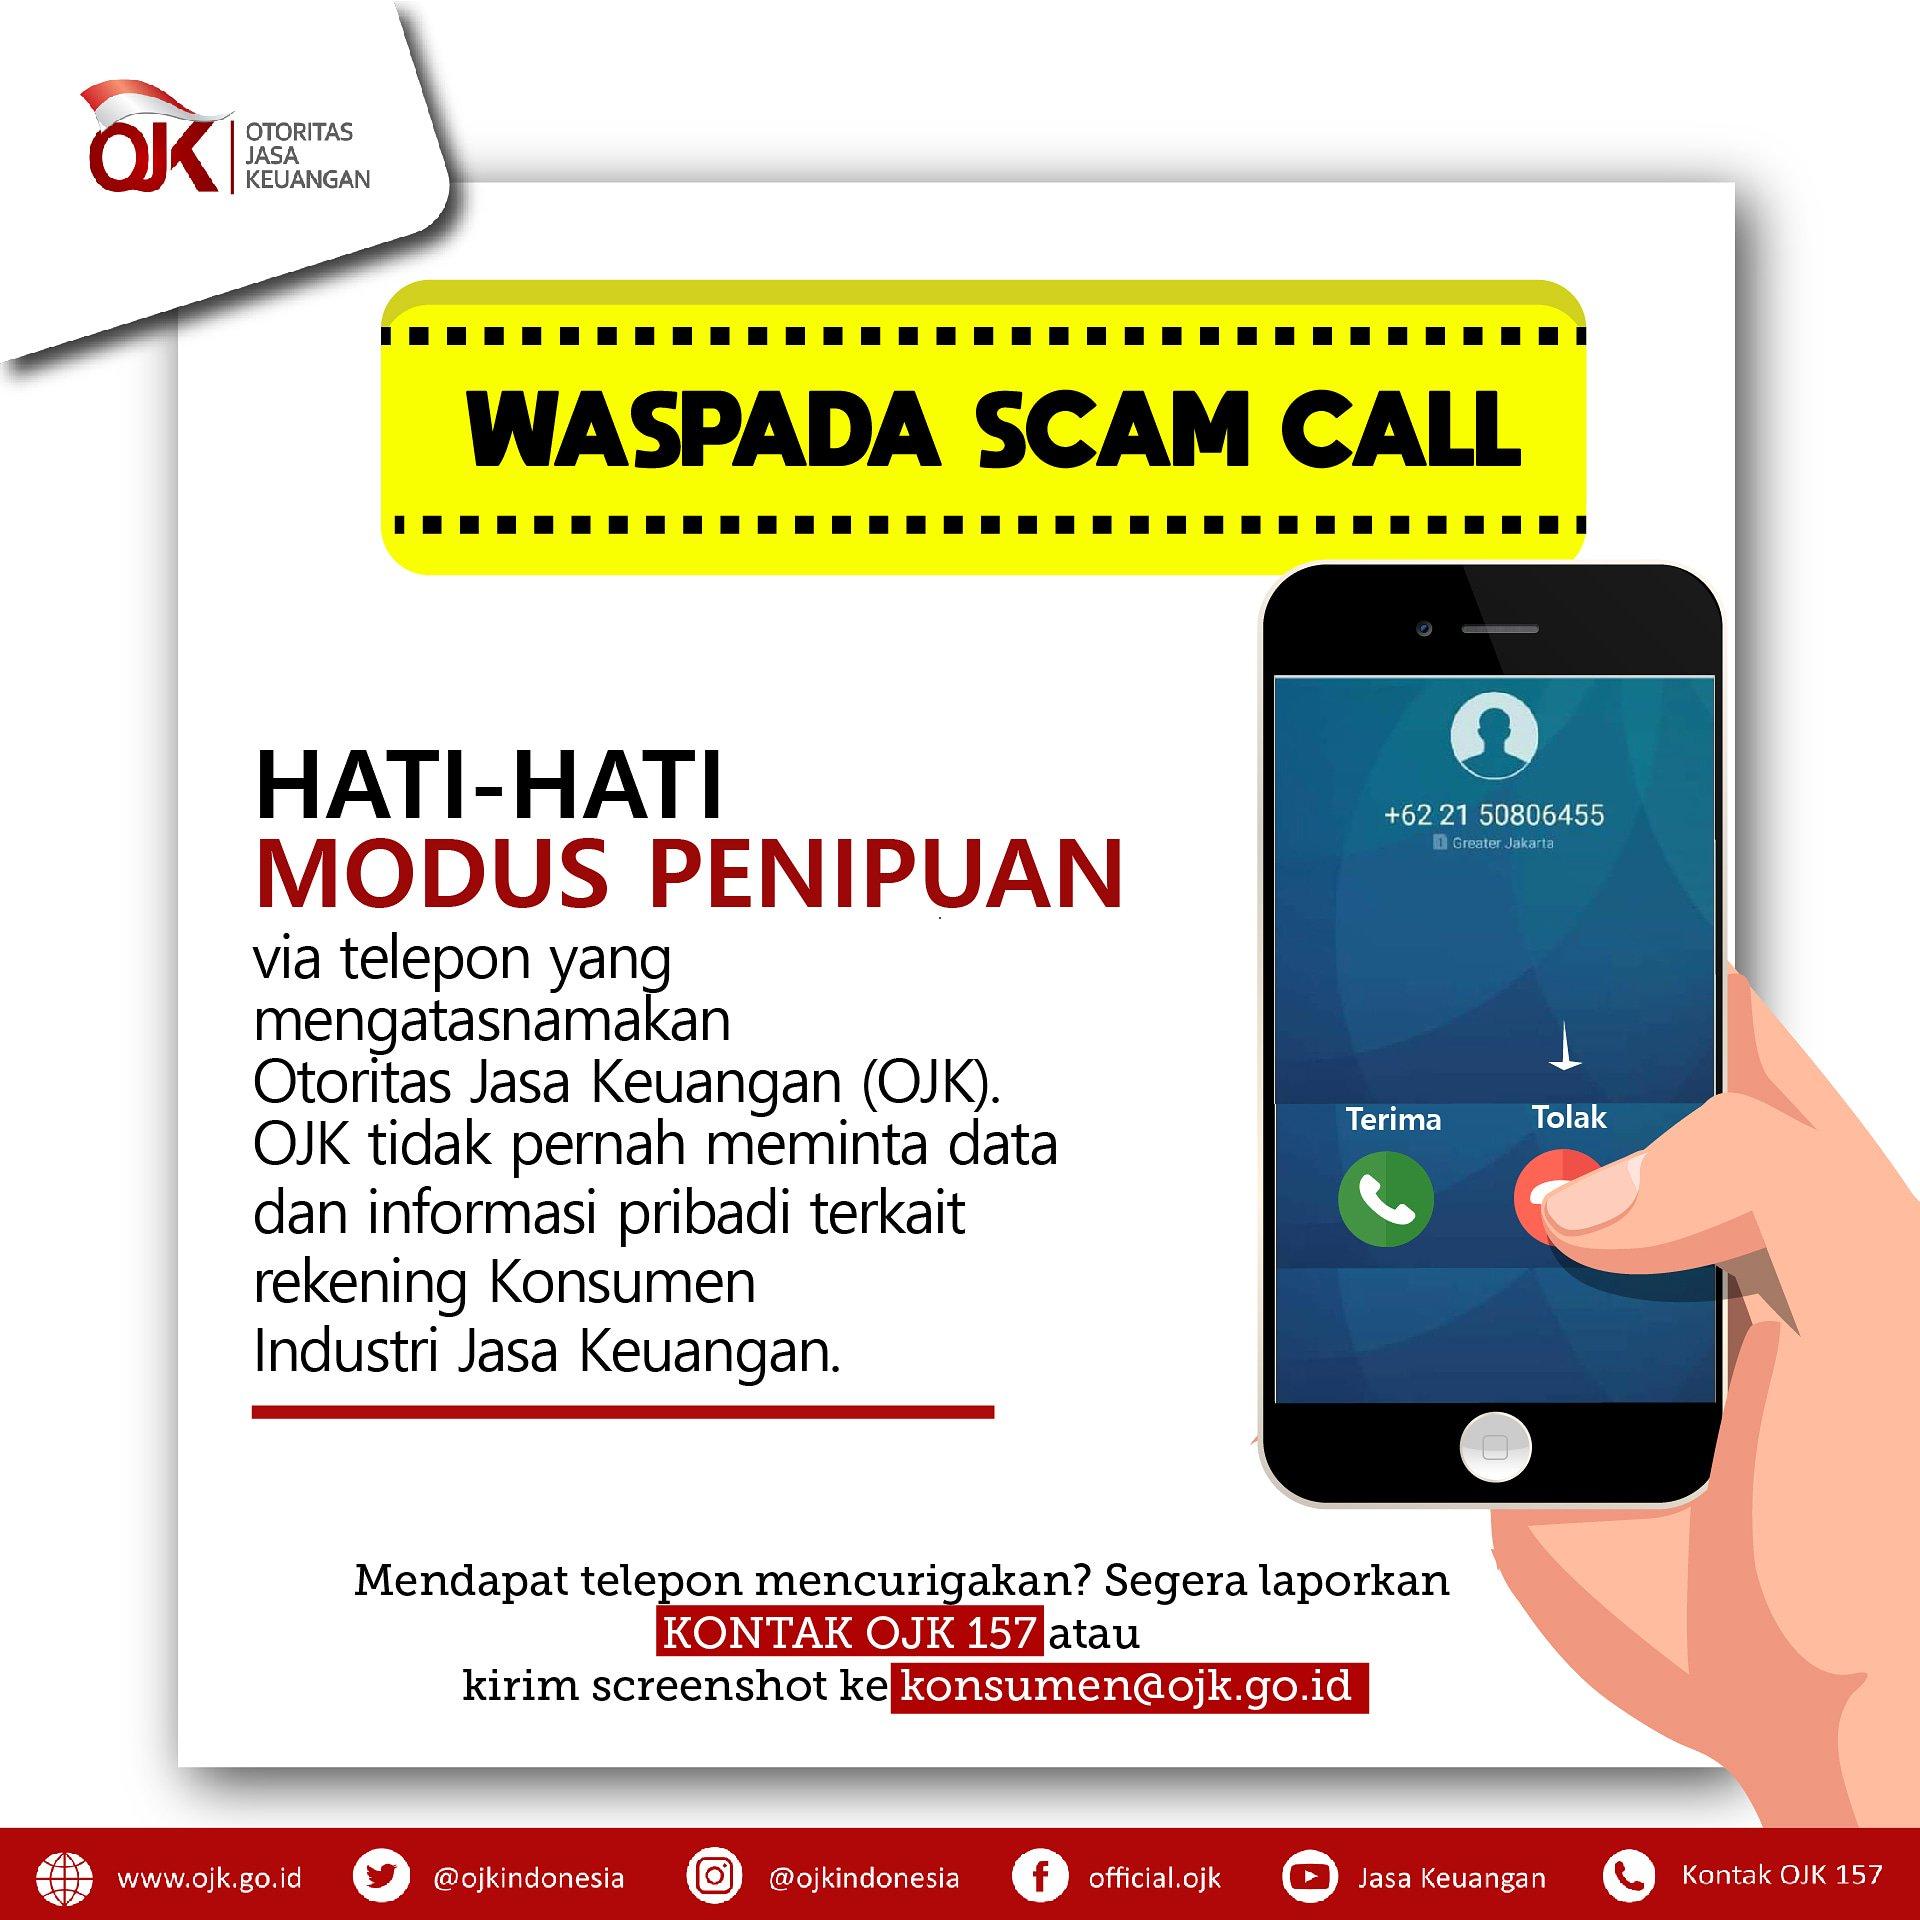 Ojk Indonesia On Twitter Jangan Diangkat Dapat Telepon